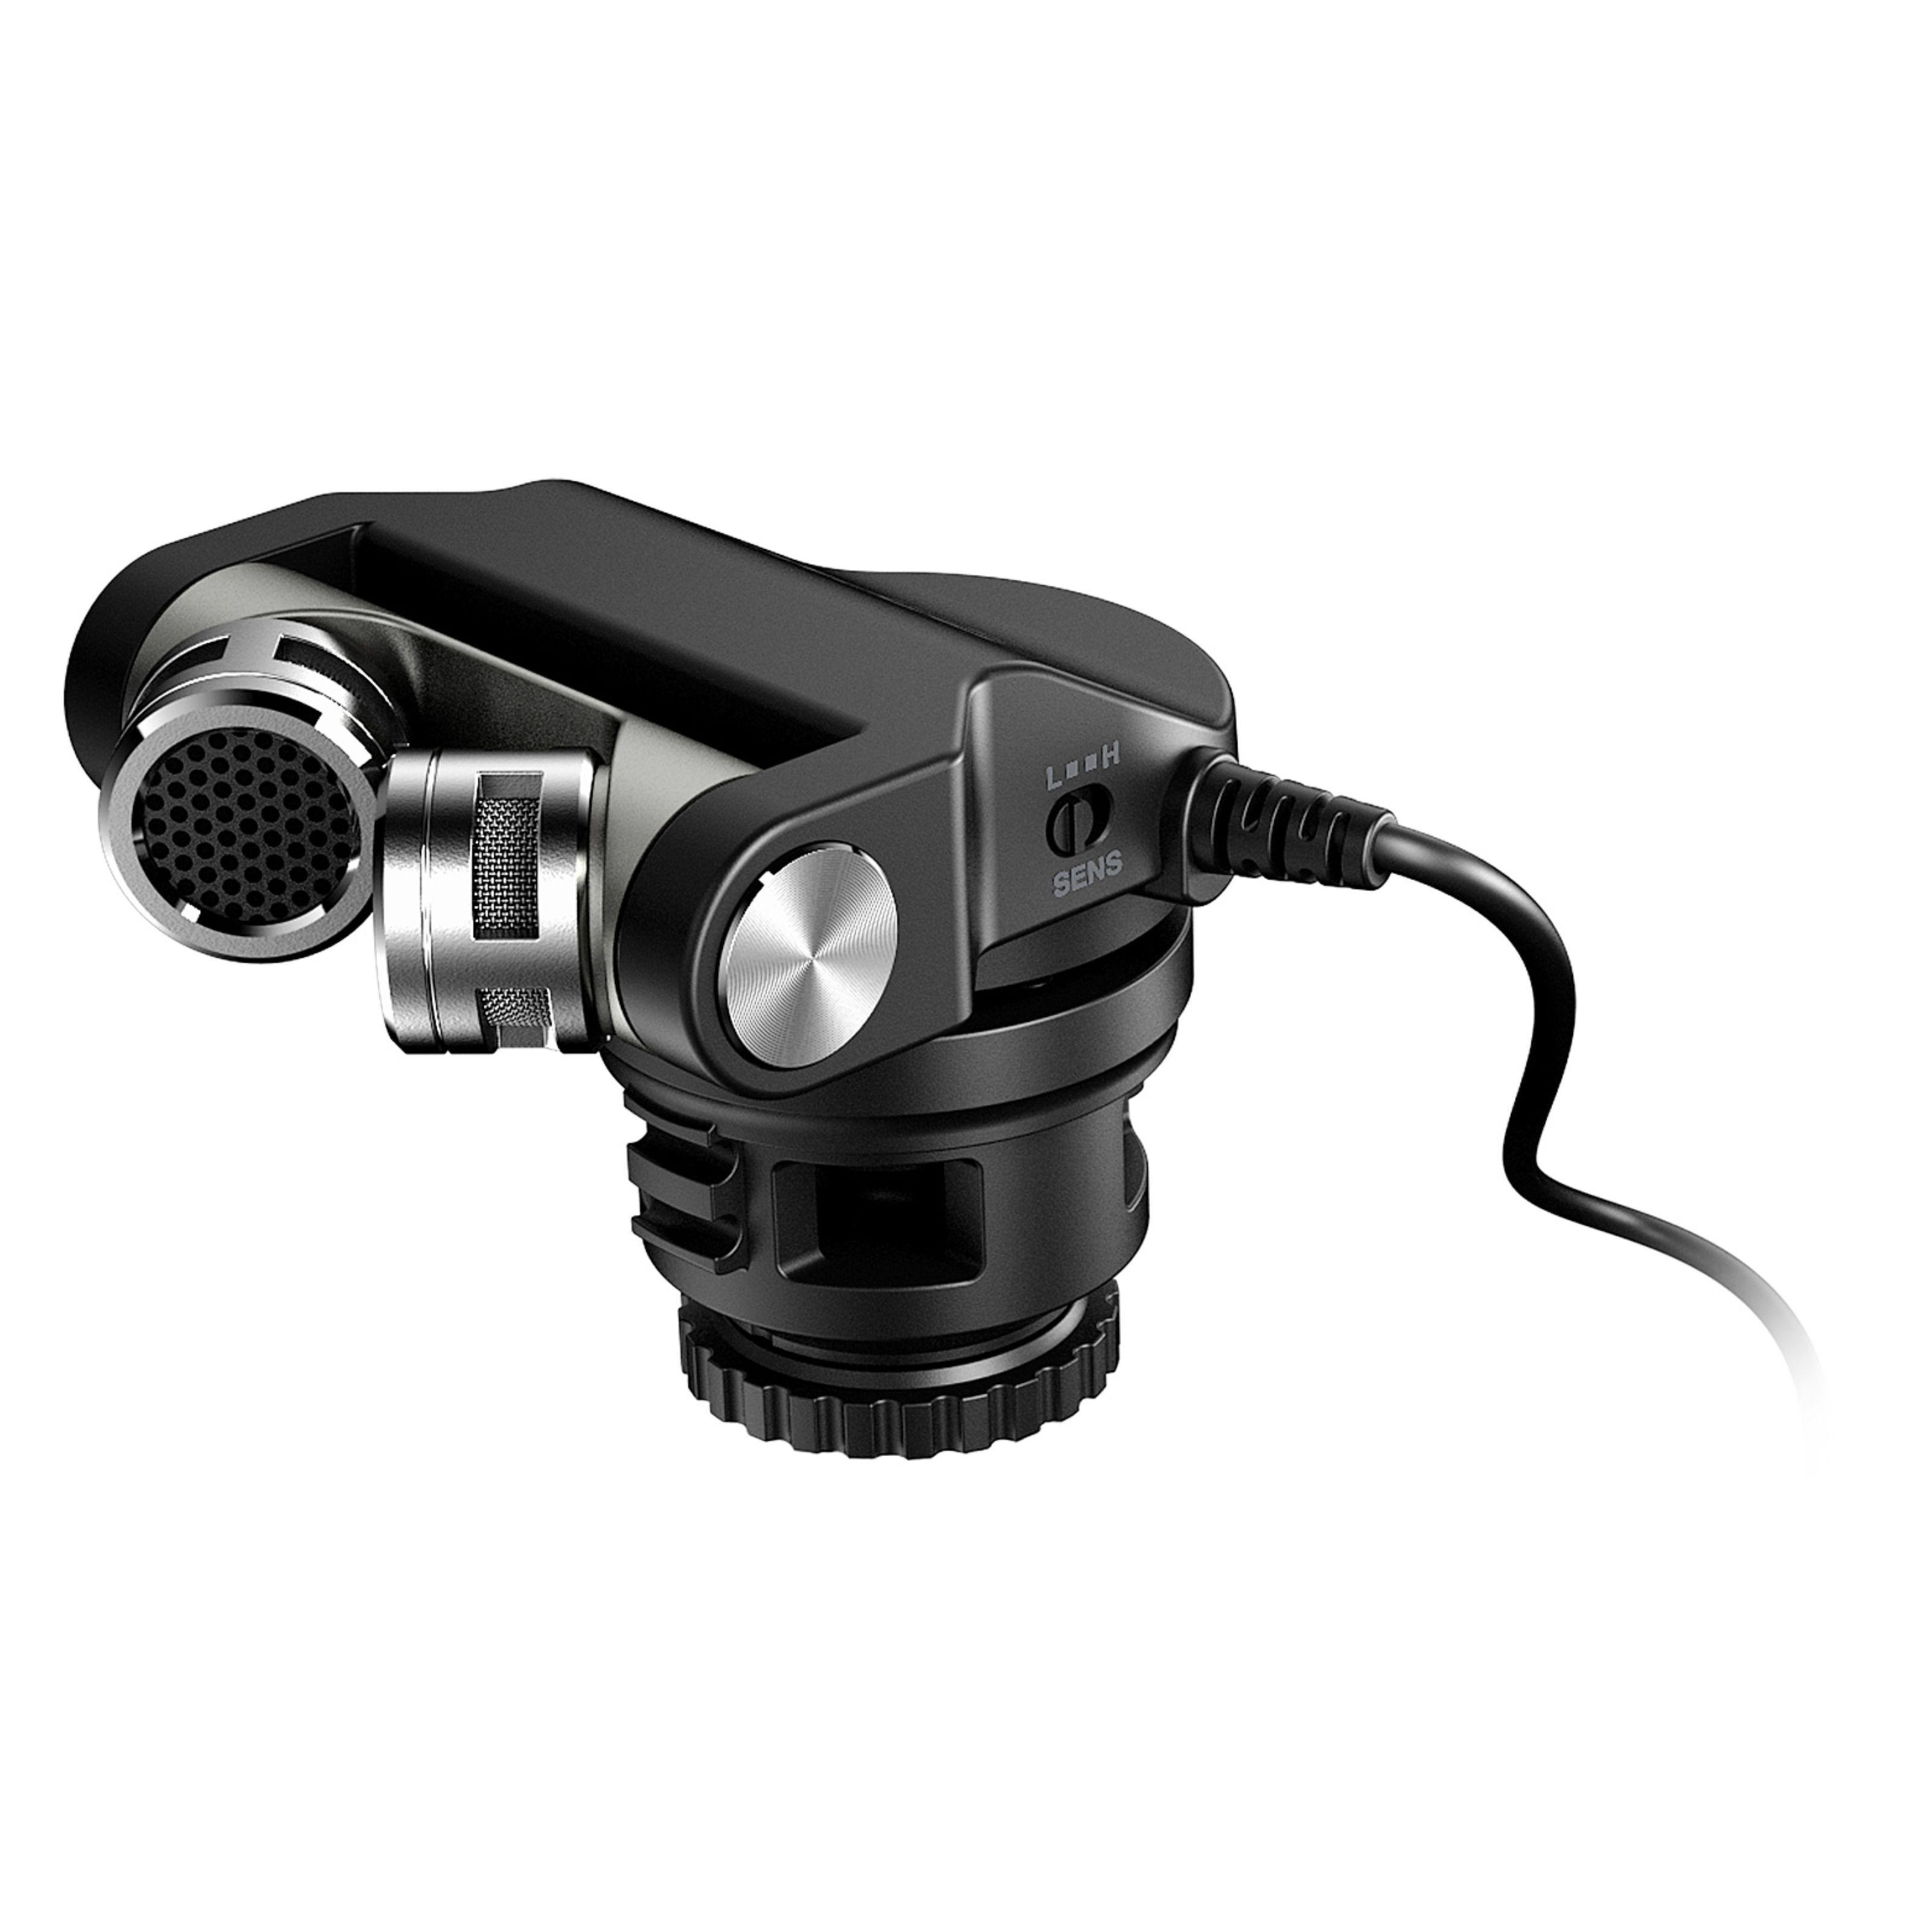 Tascam TM-2X Micrófono para cámaras digitales